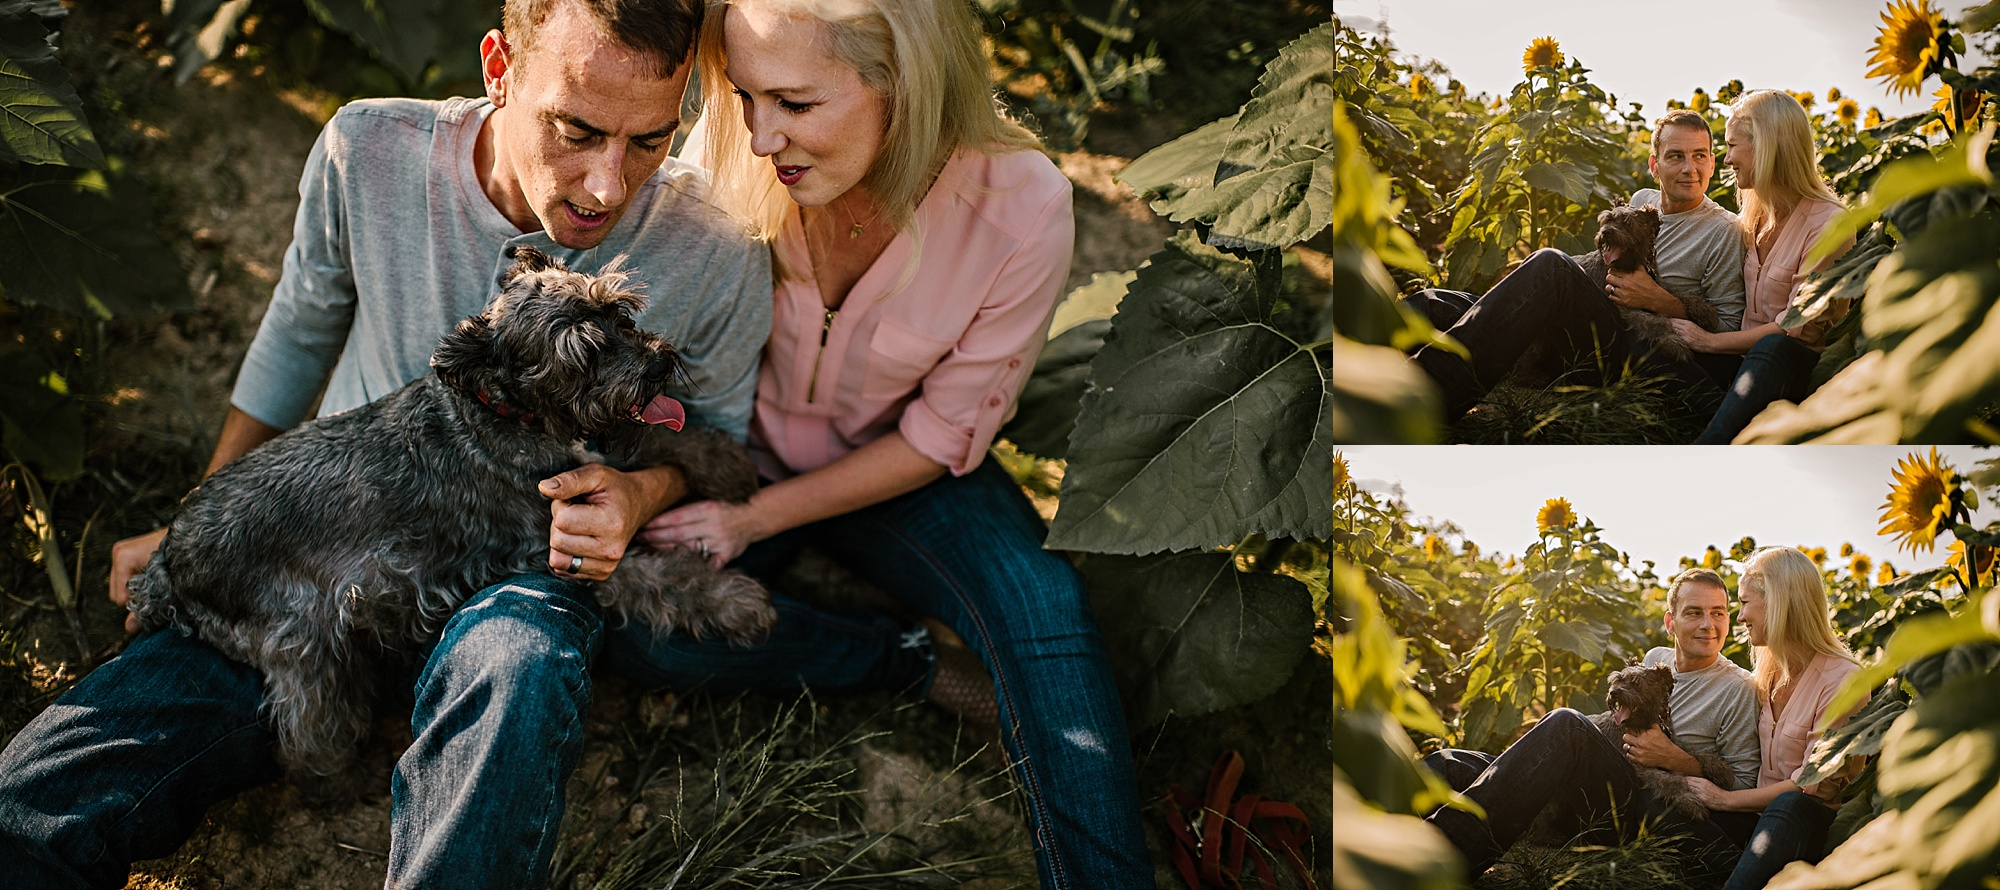 Lori-and-mike-akron-ohio-photographer-lauren-grayson-sunflower-field-session_0019.jpg